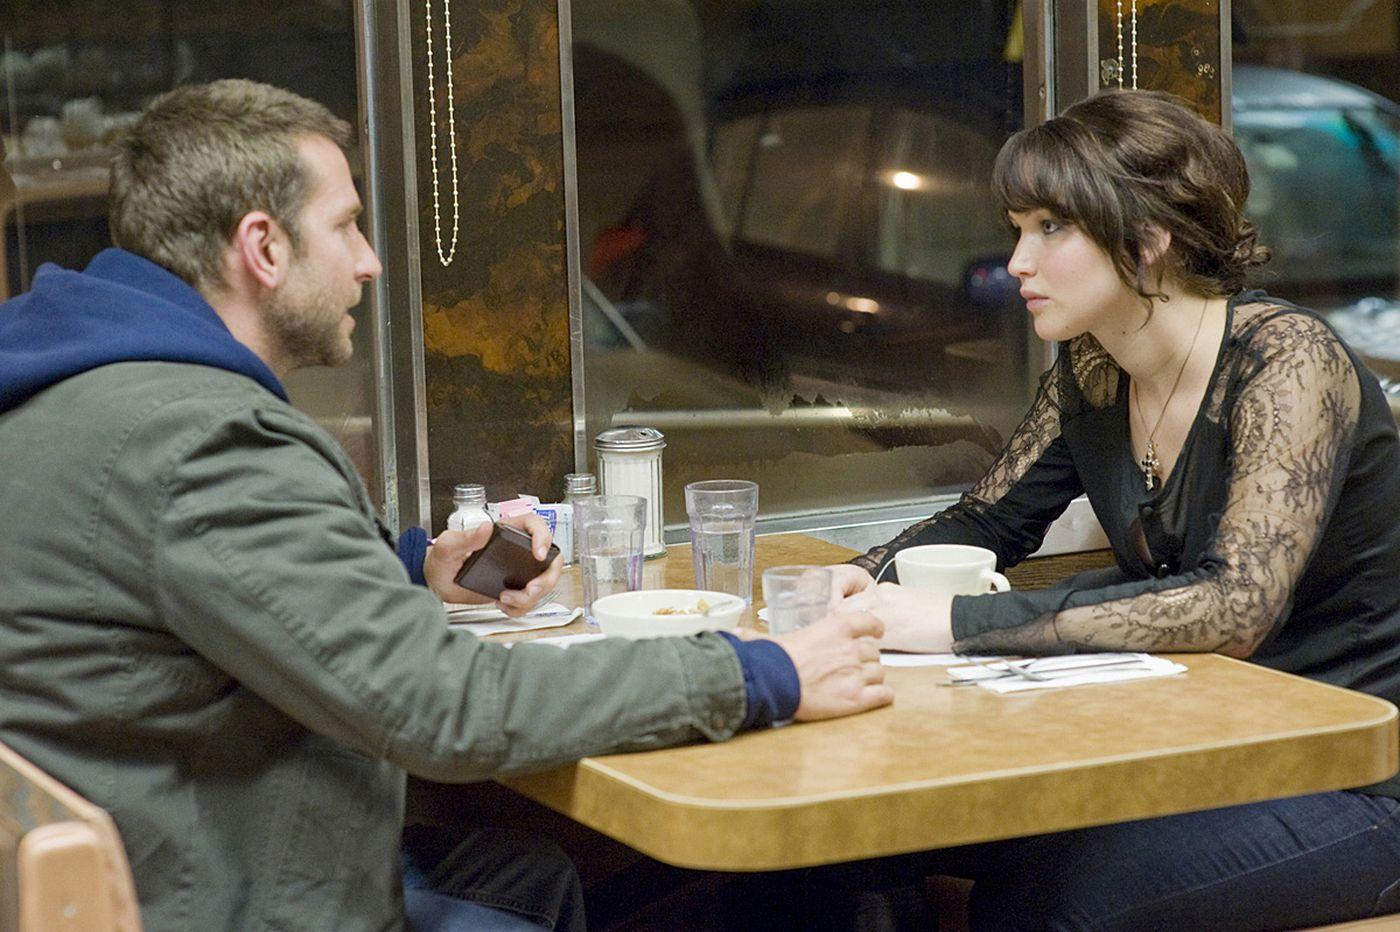 Pa.'s 'favorite' romantic comedy? Hint: It stars Bradley Cooper.